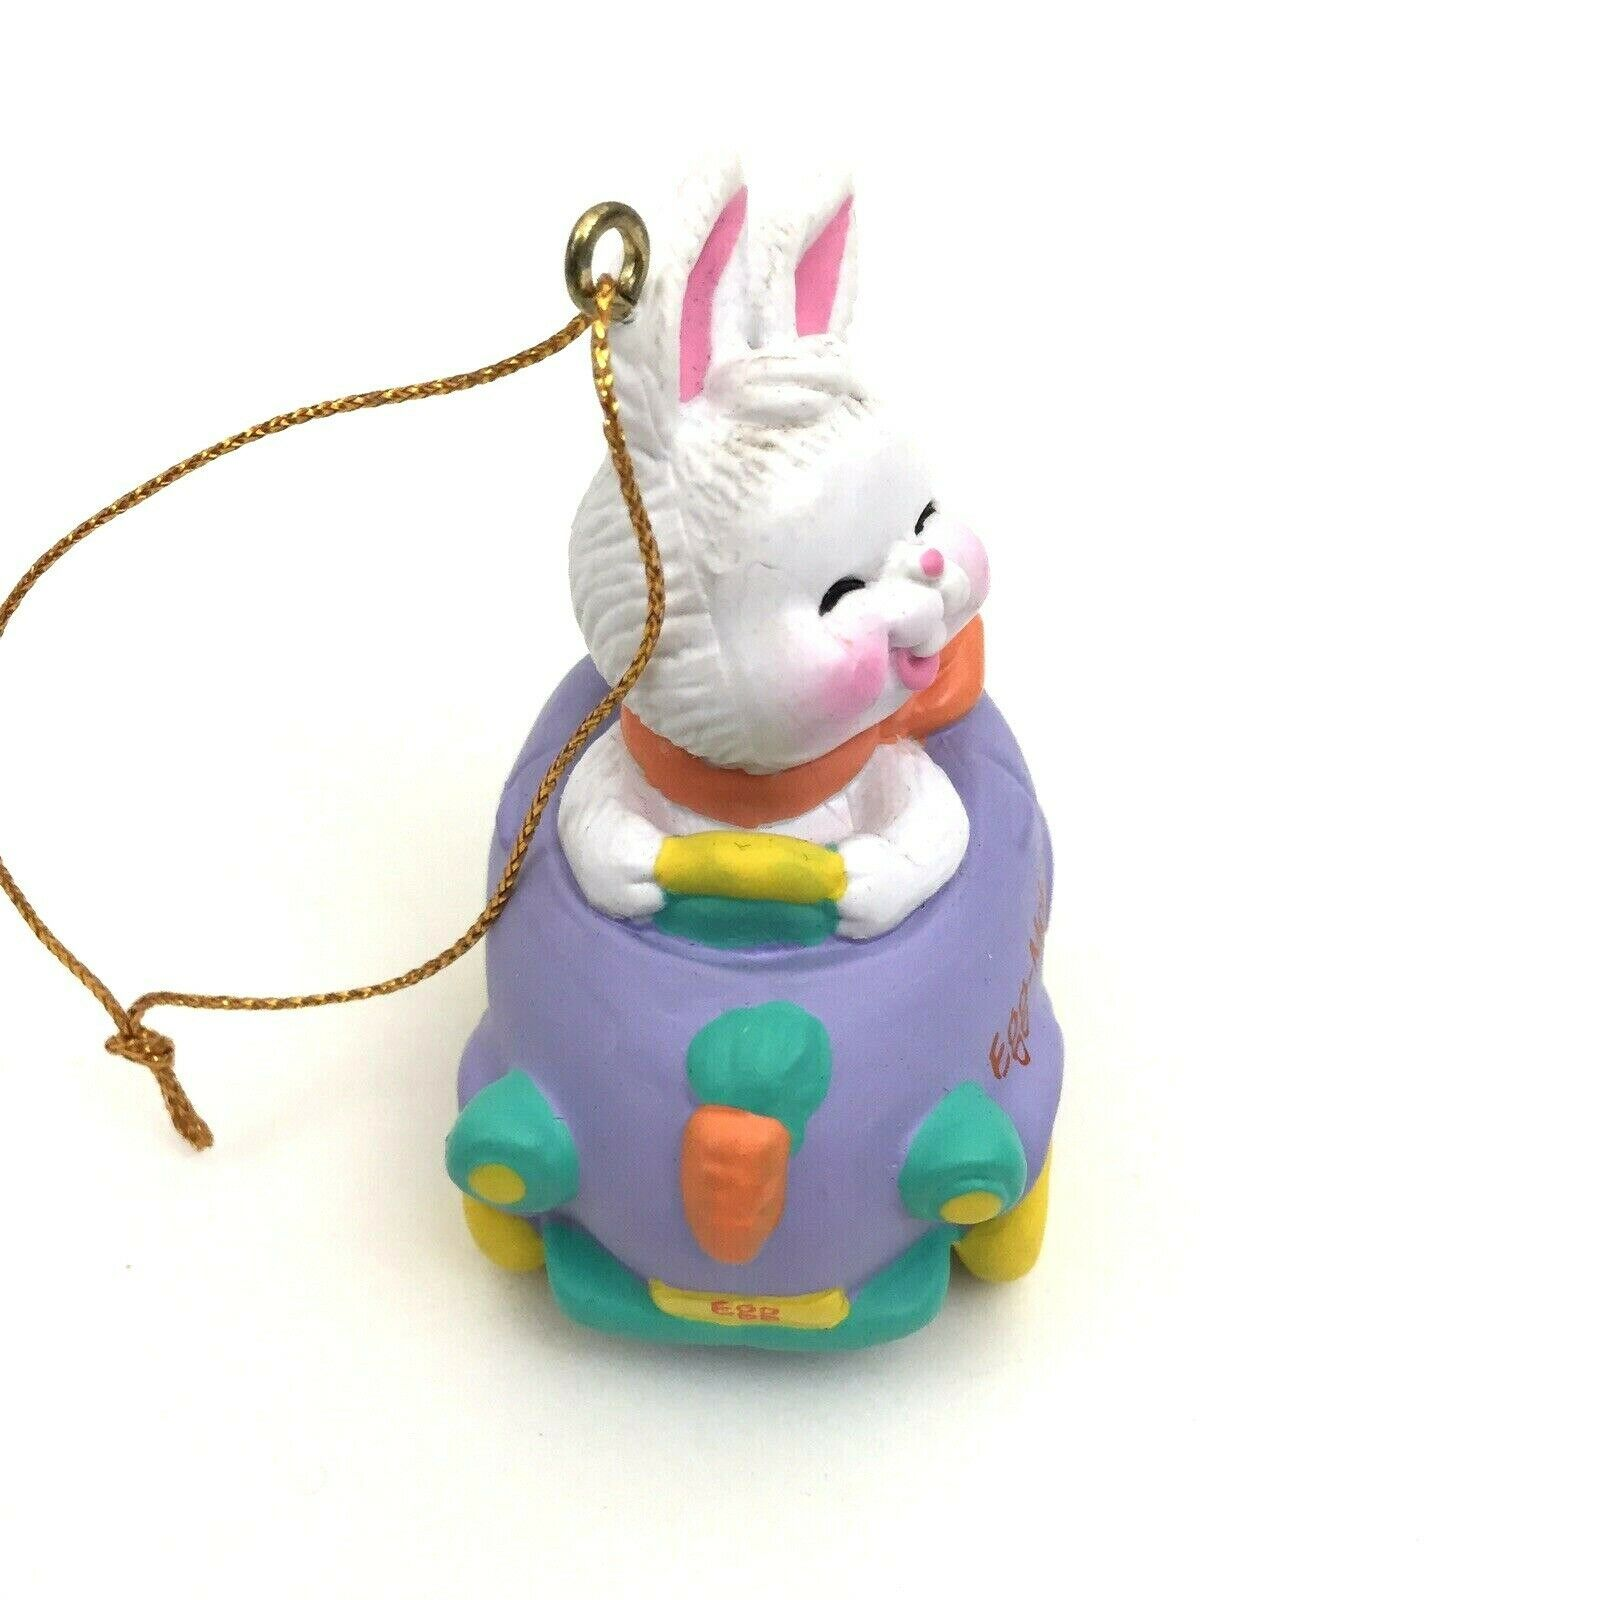 Vintage Easter Avon Eggspression Egg Car Mobile Ornament Bunny Rabbit in Box